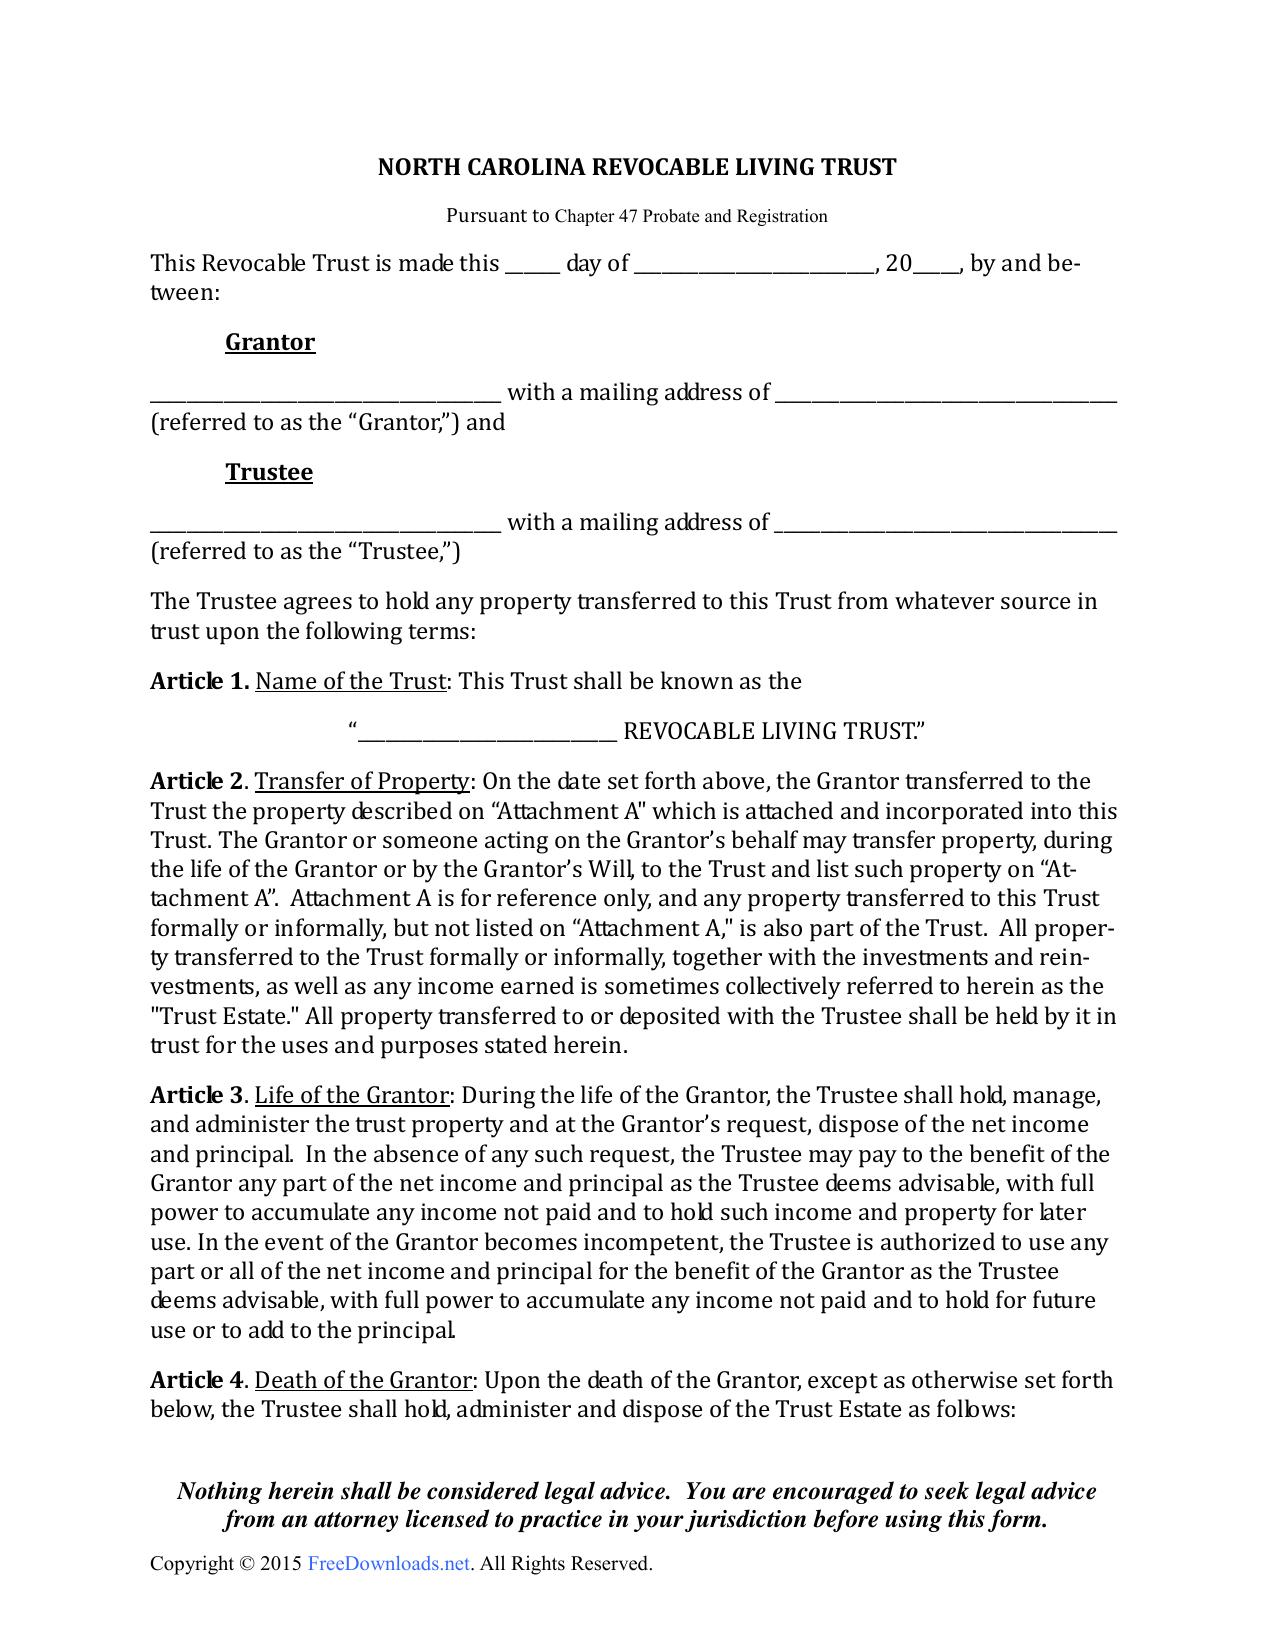 Download North Carolina Revocable Living Trust Form Pdf Rtf